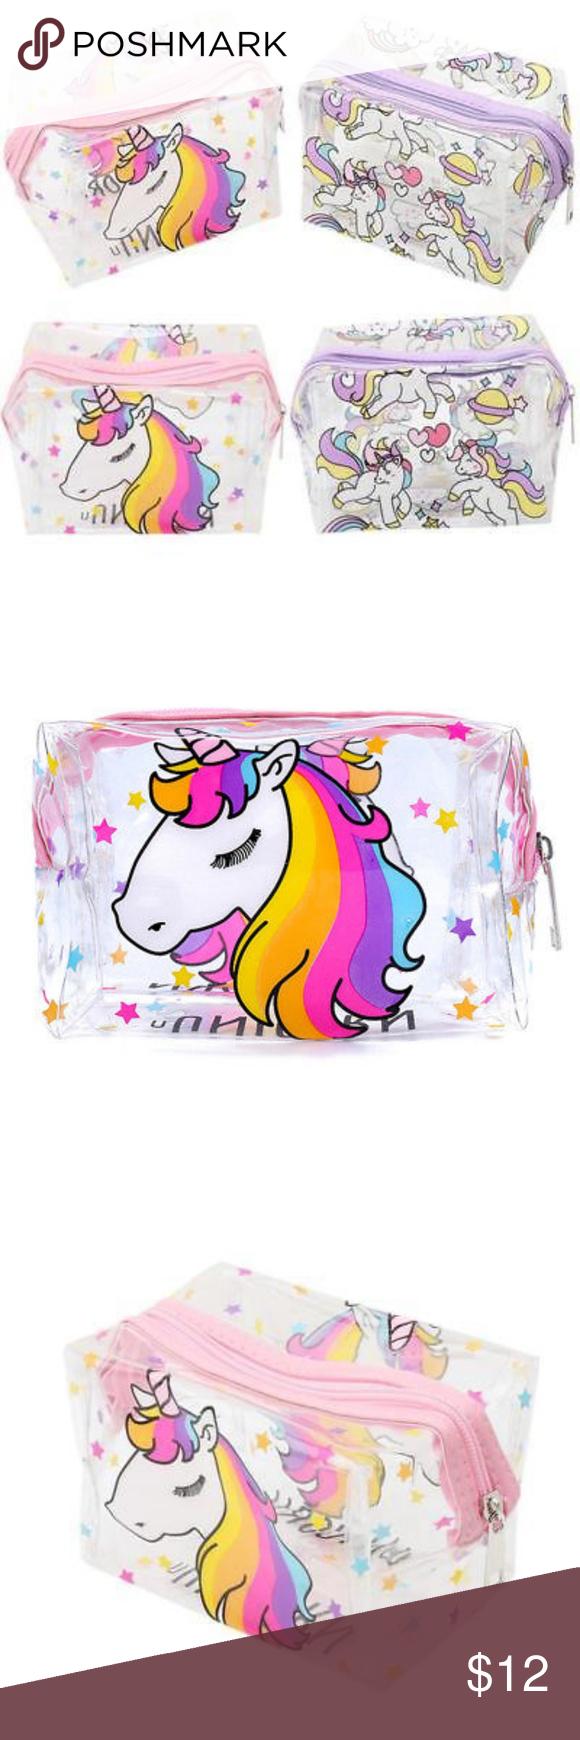 Cute Unicorn makeup bag cosmetics pouch NEW unused Unicorn